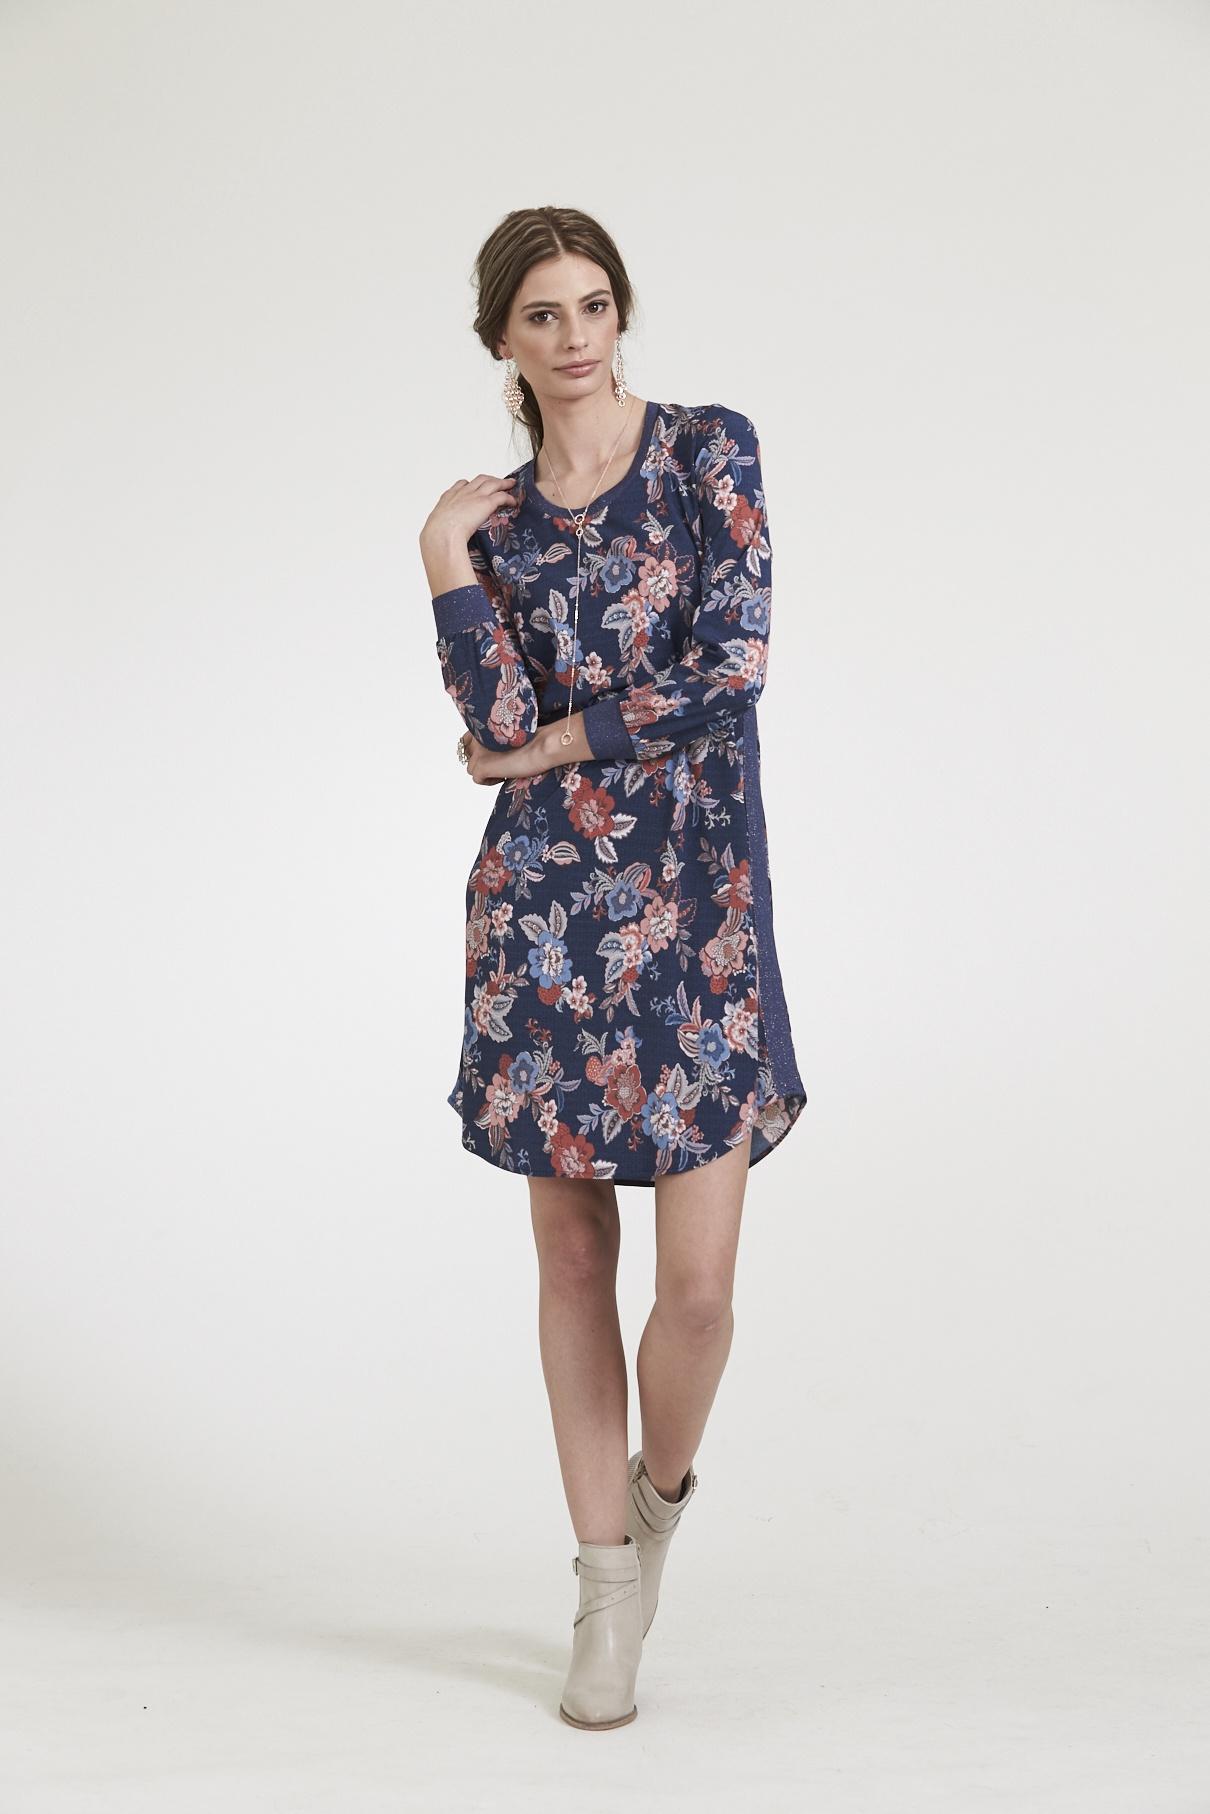 ls1306 Tapestry  Dress